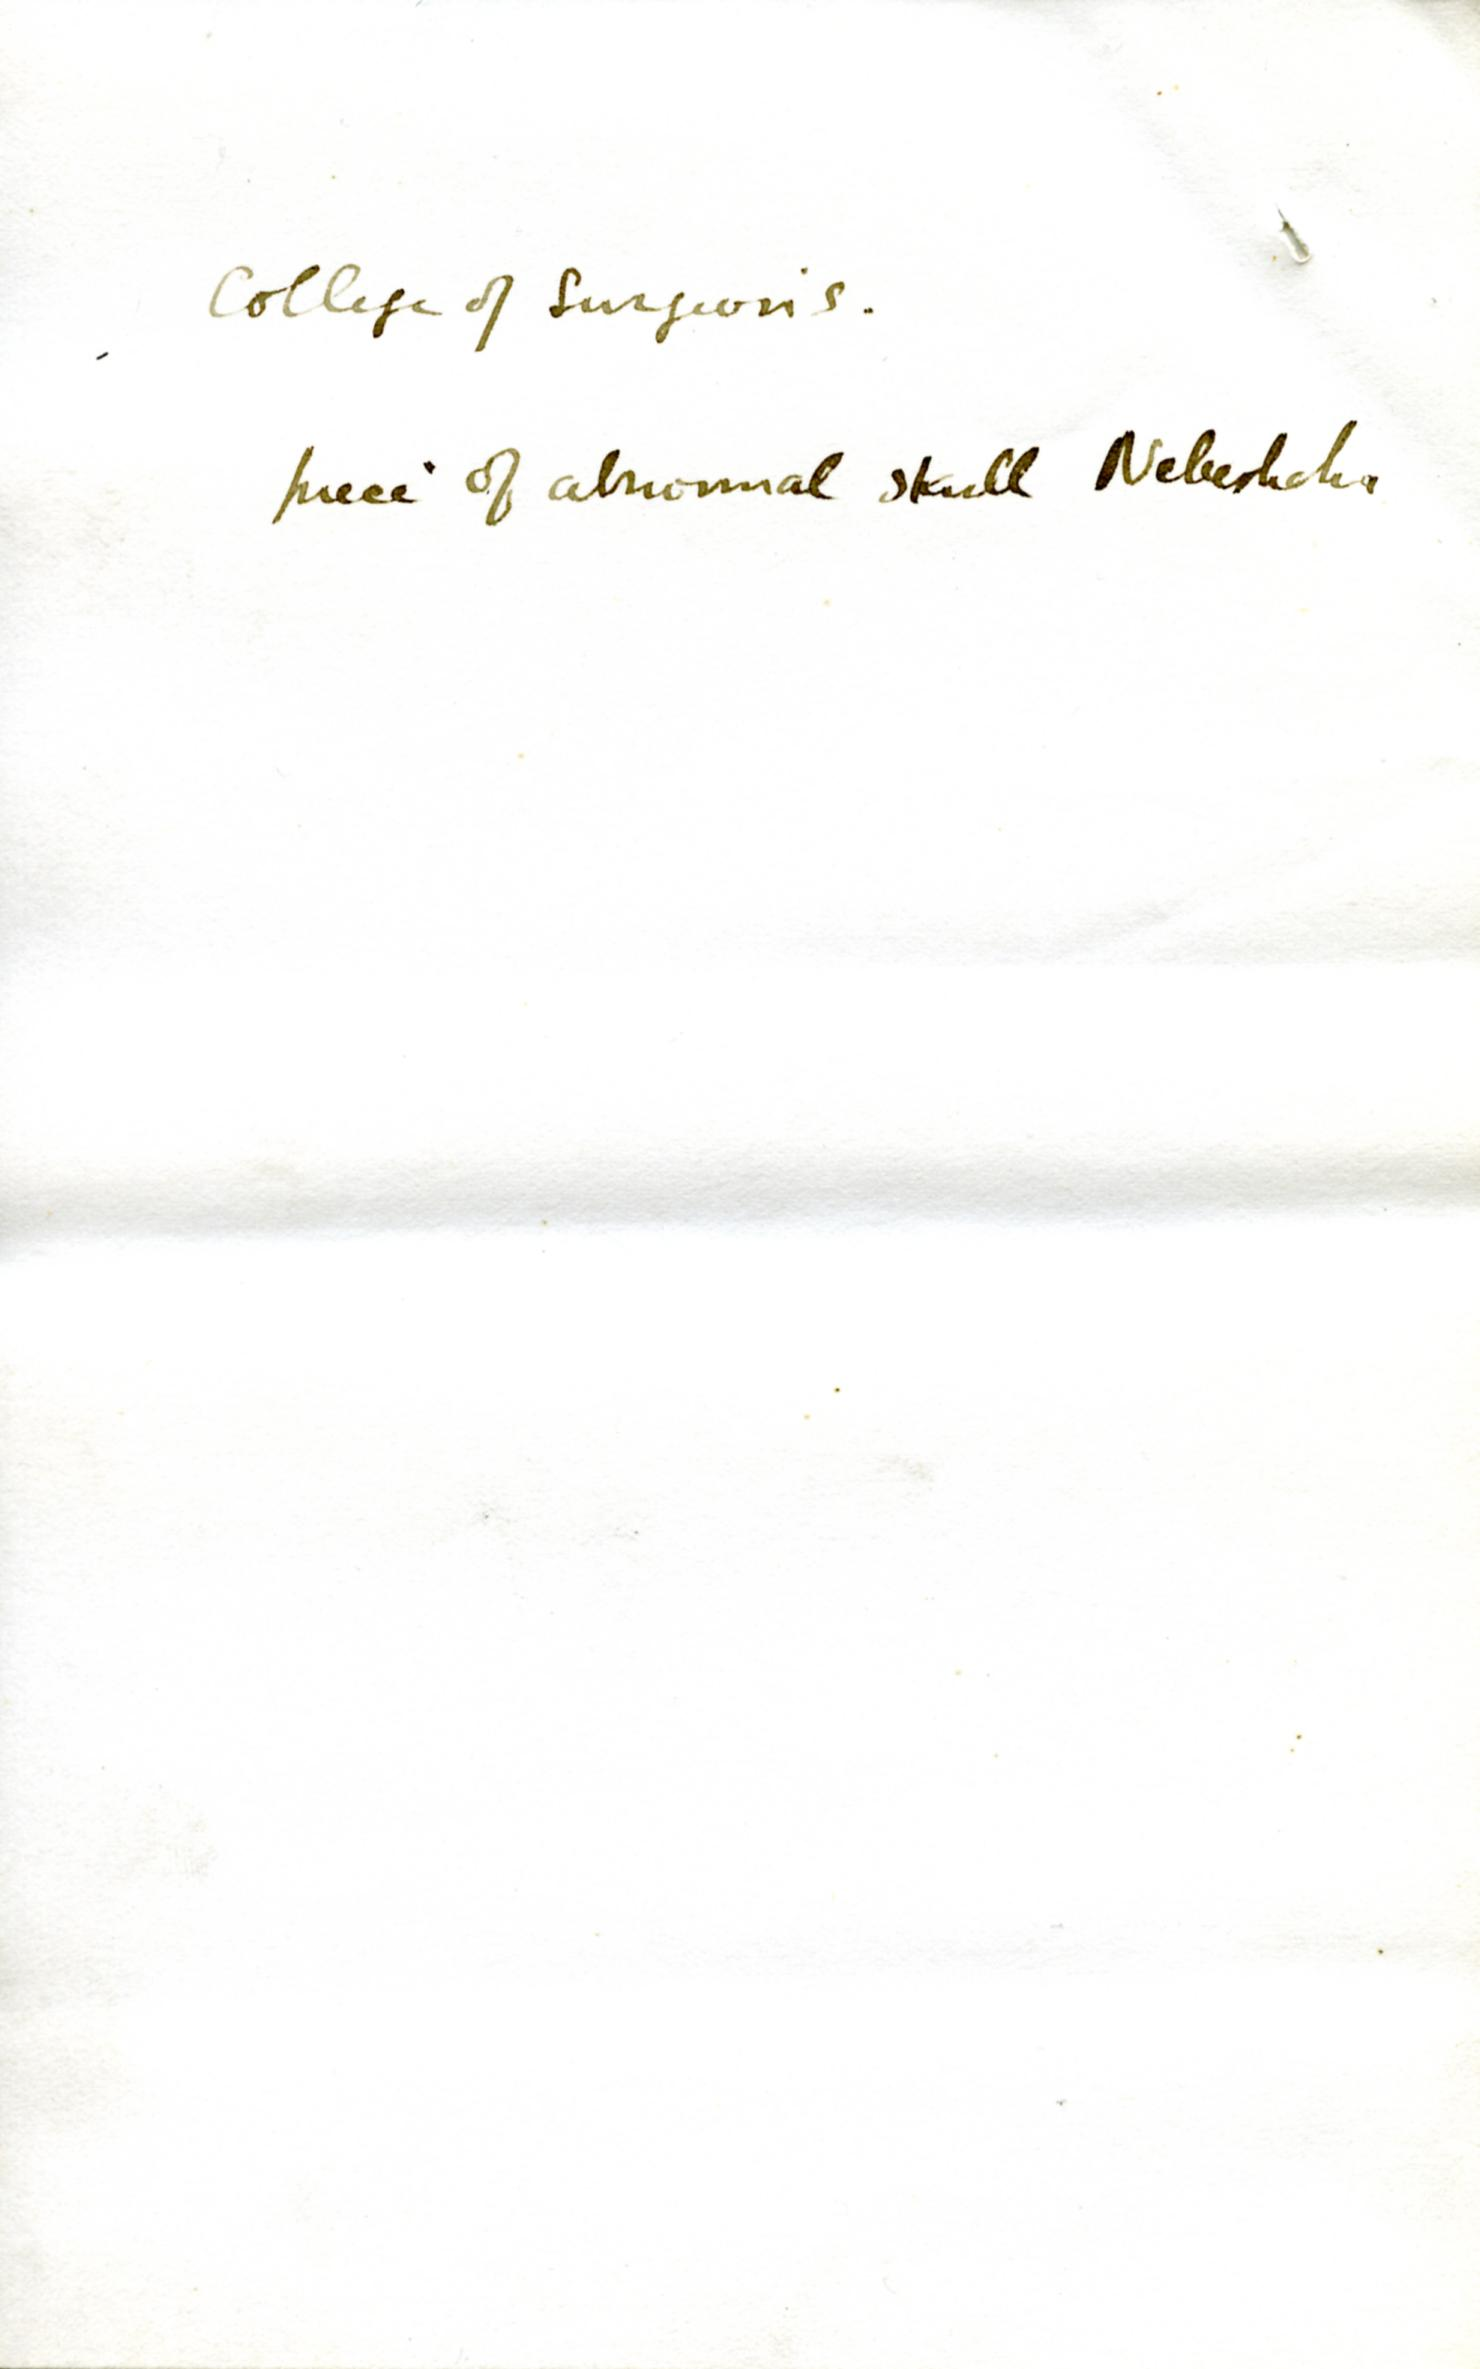 1886 Nebesheh Tell Dafana 1884 el-Qantara, Tell Gemayemi, Tell Sueilin DIST.09.09b